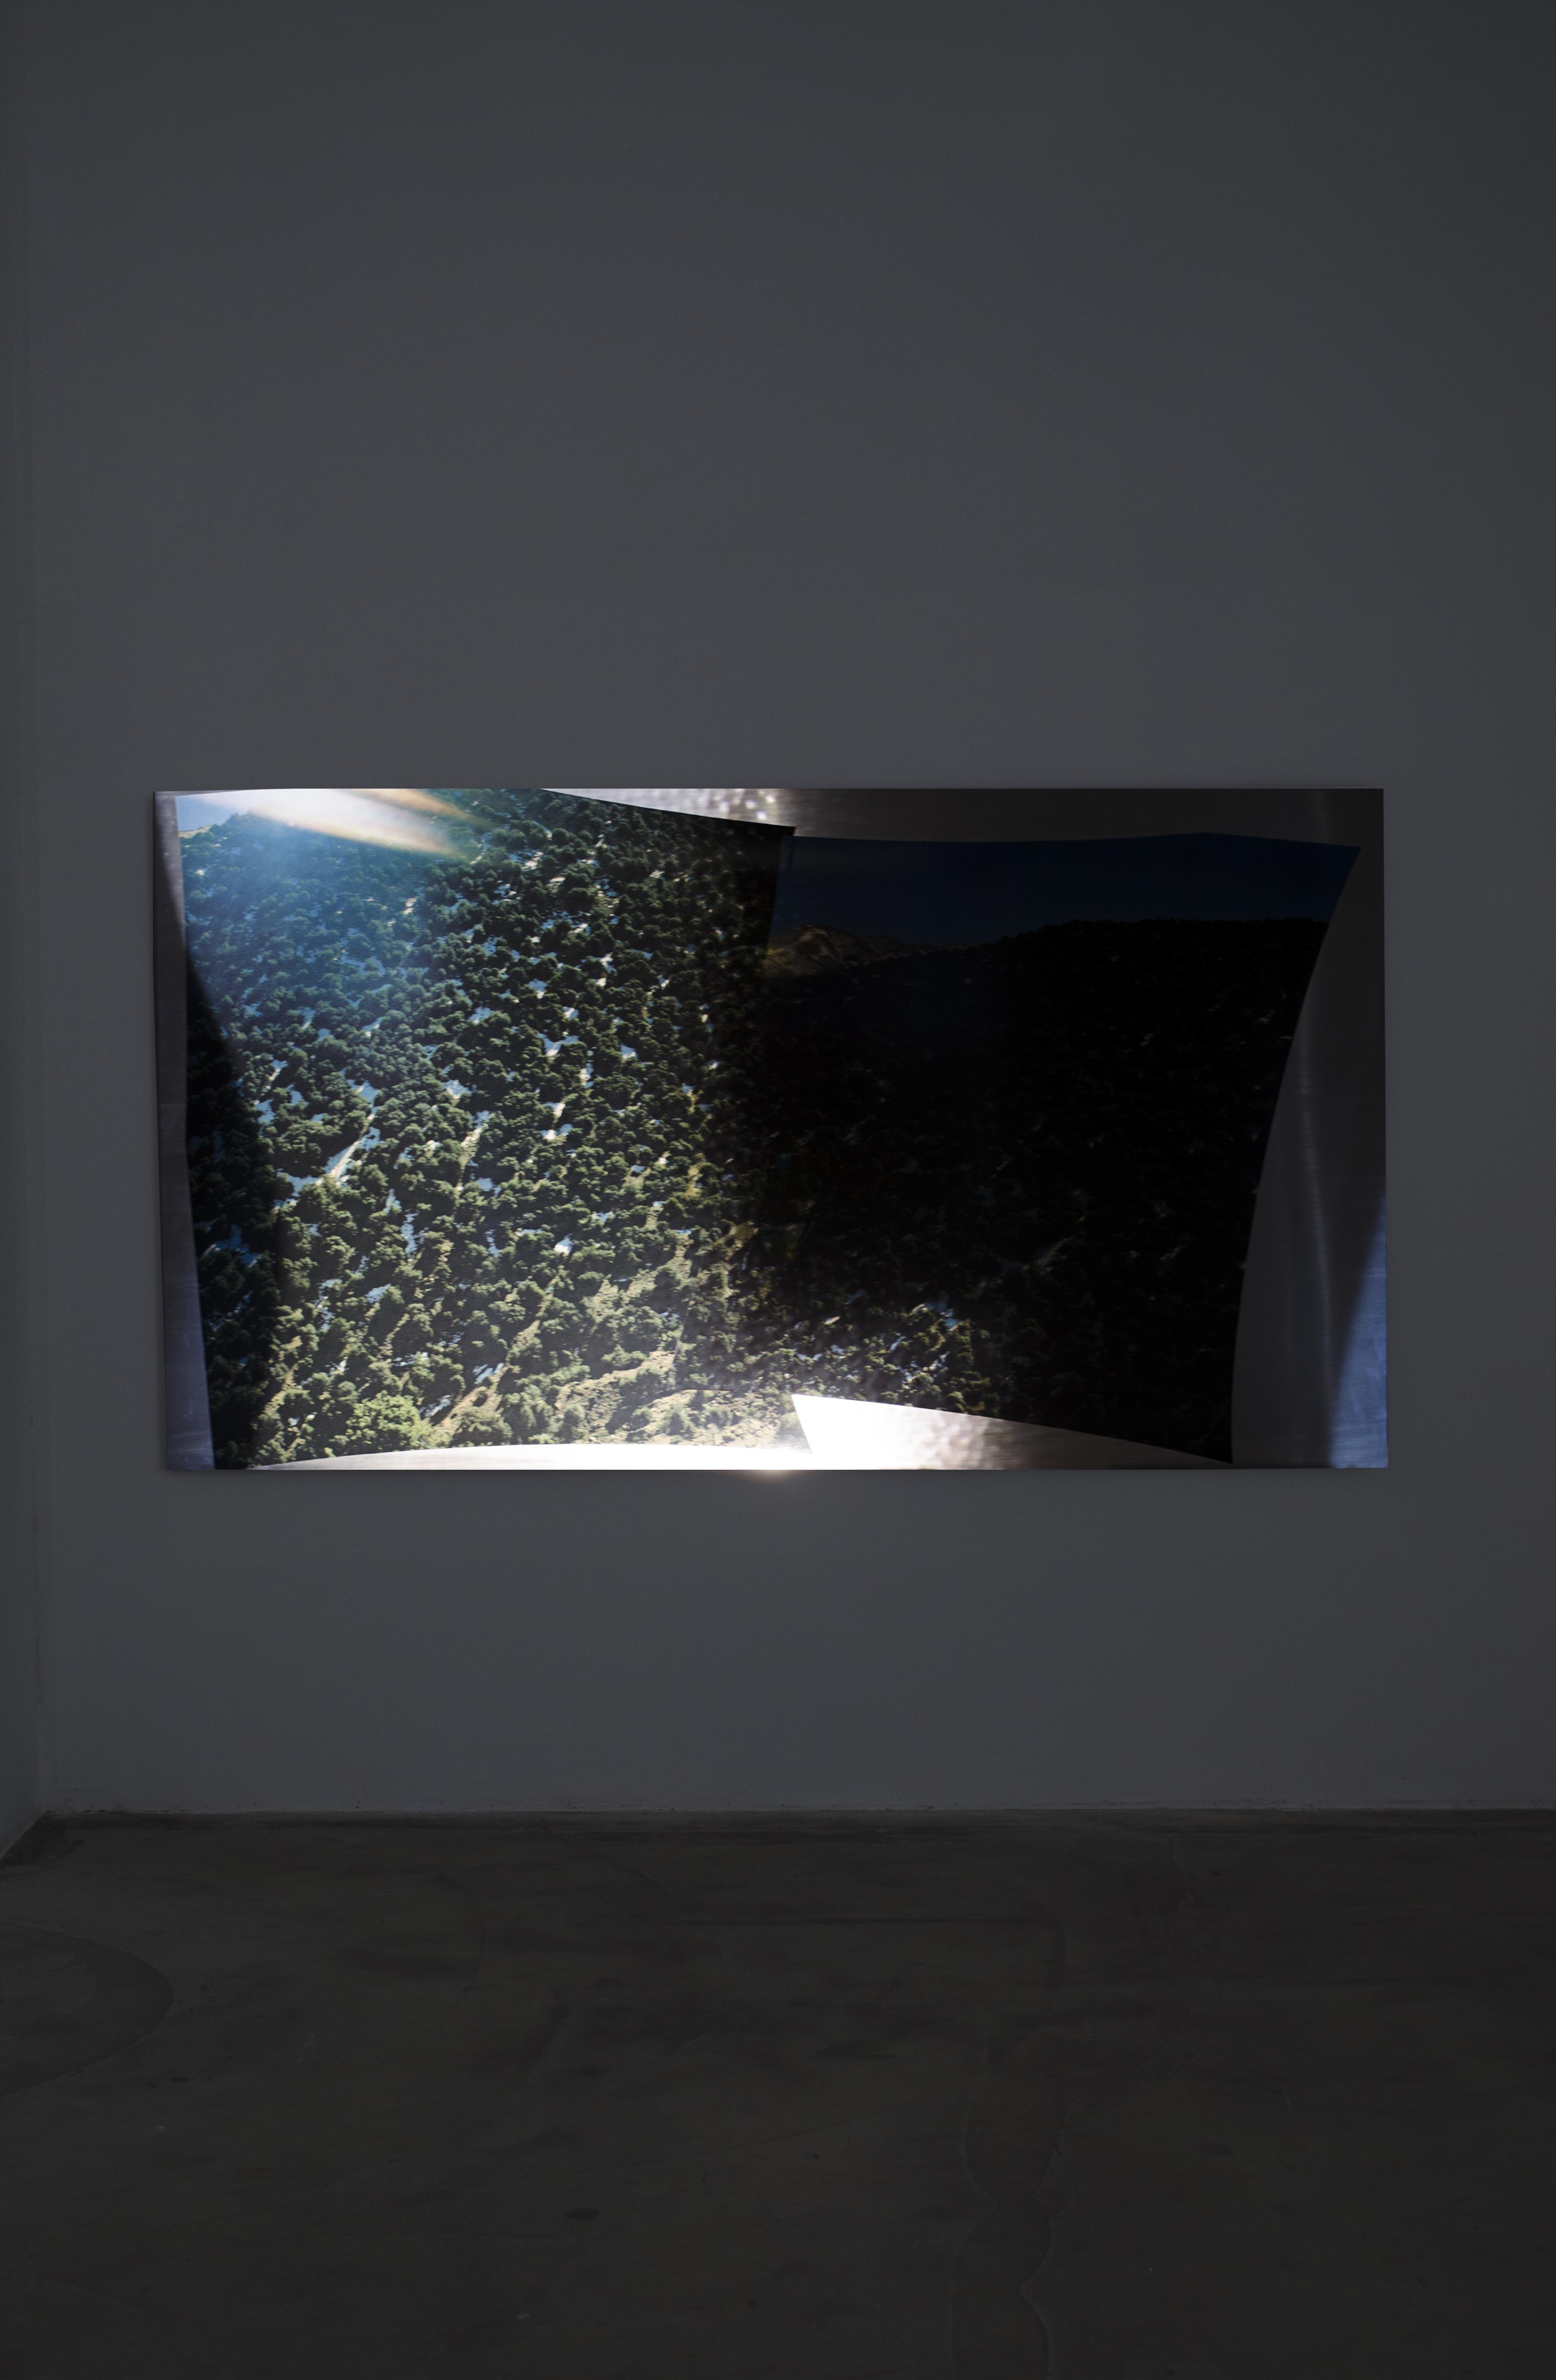 Josephine-Callaghan_High-pass, C-type print, sheet aluminium, projected video, 2300 x 1250